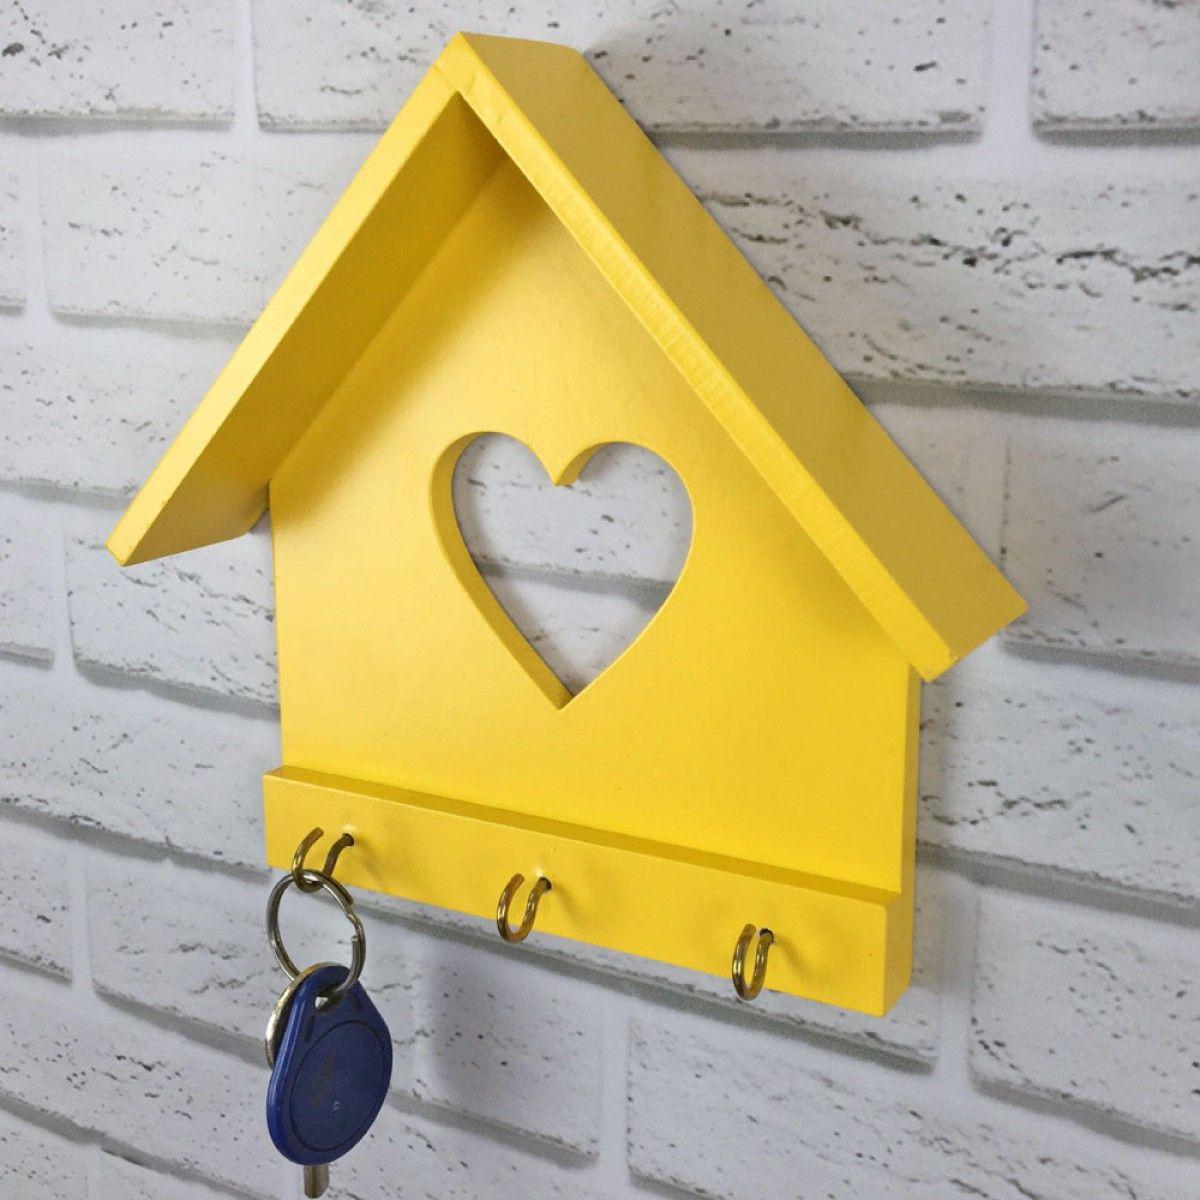 Porta chaves Casinha Amarela! - Tadah! Design | Madeira | Pinterest ...